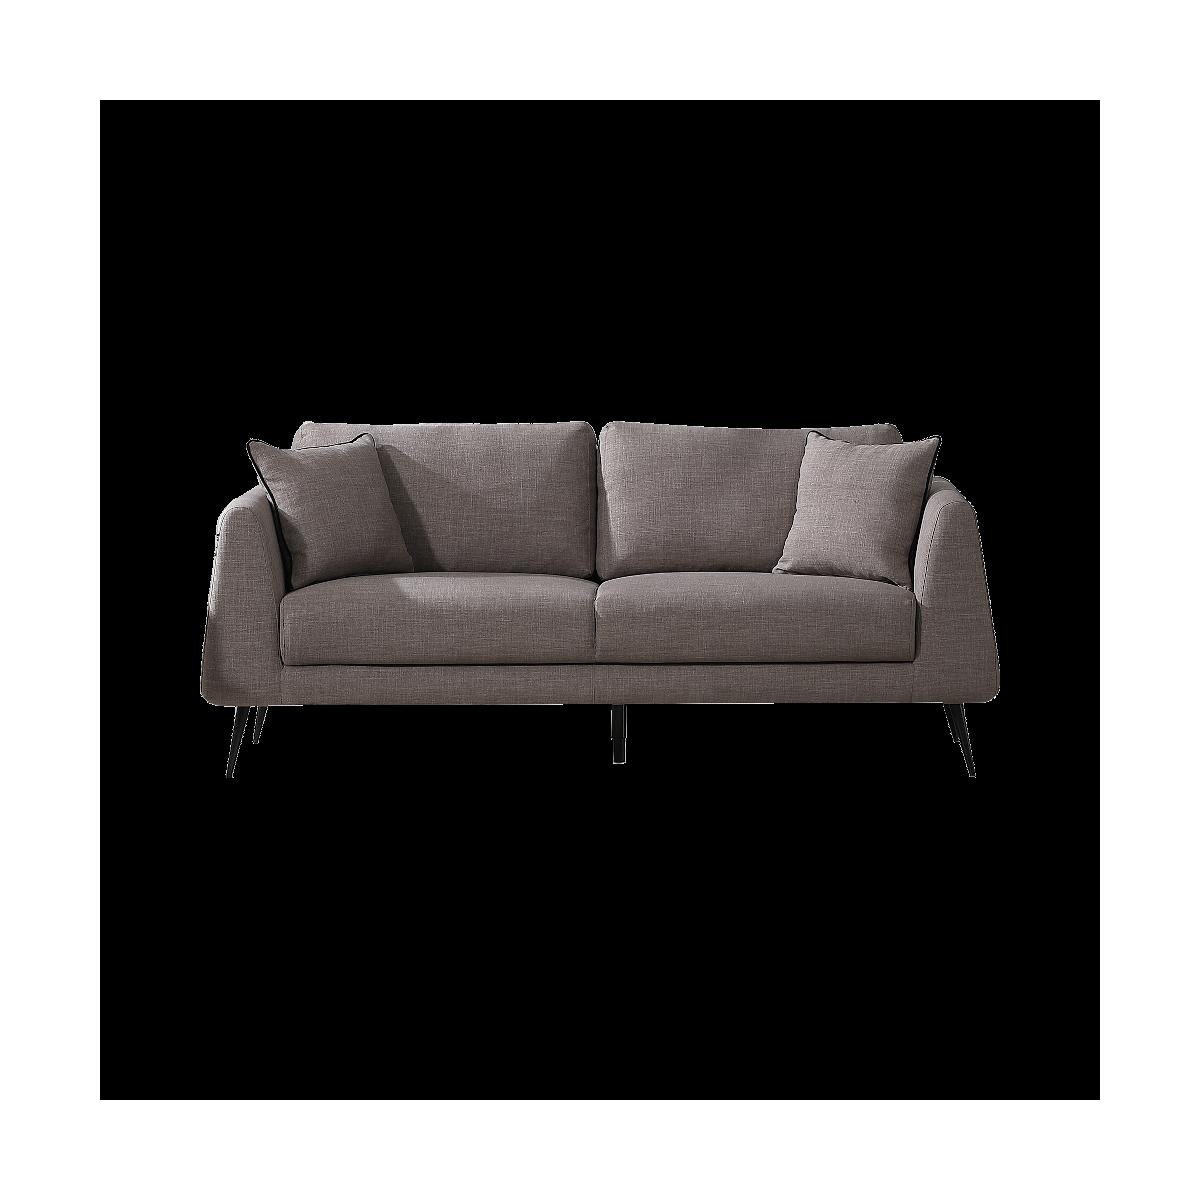 Macbeth Fabric Sofa